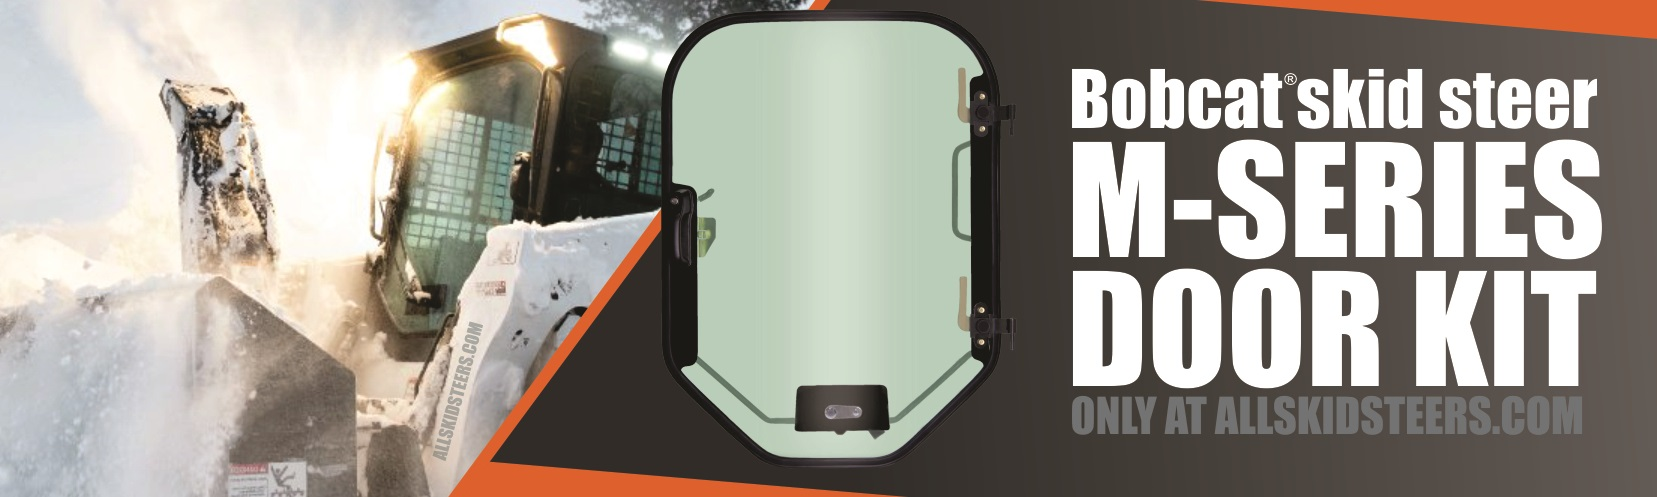 m-series door for bobcat skid steer loader